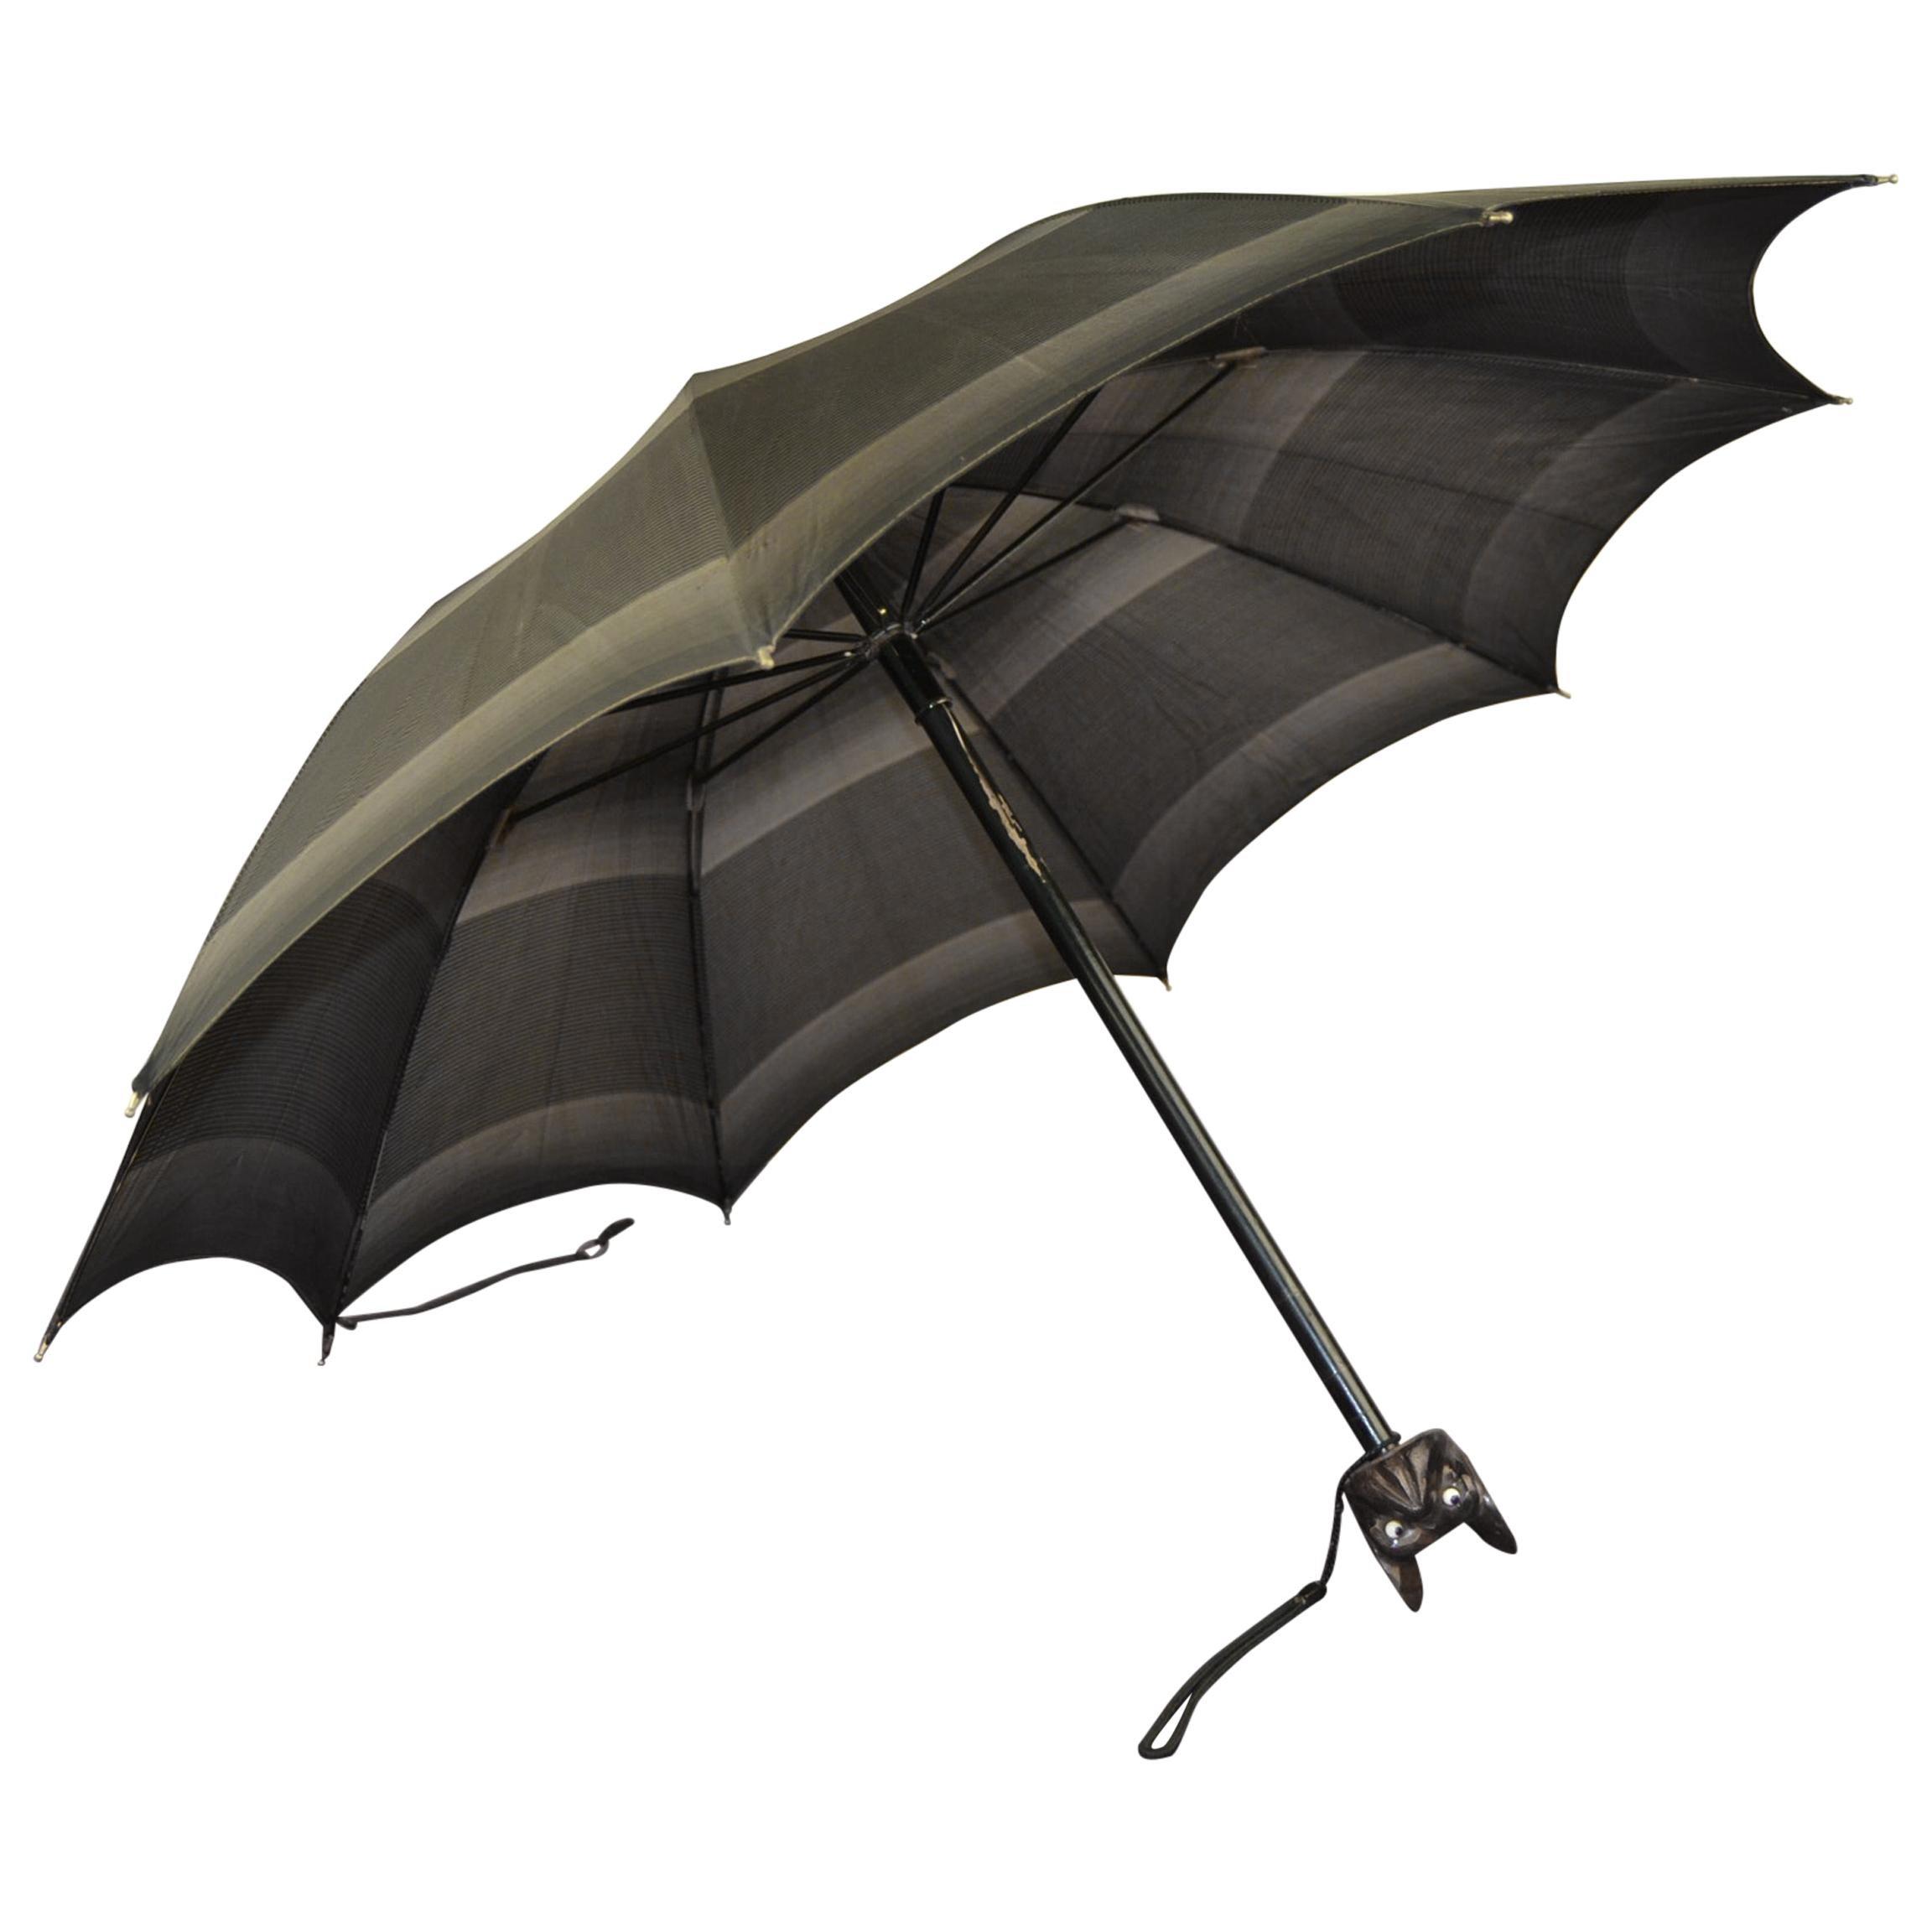 Antique Umbrella with French Bulldog Handle